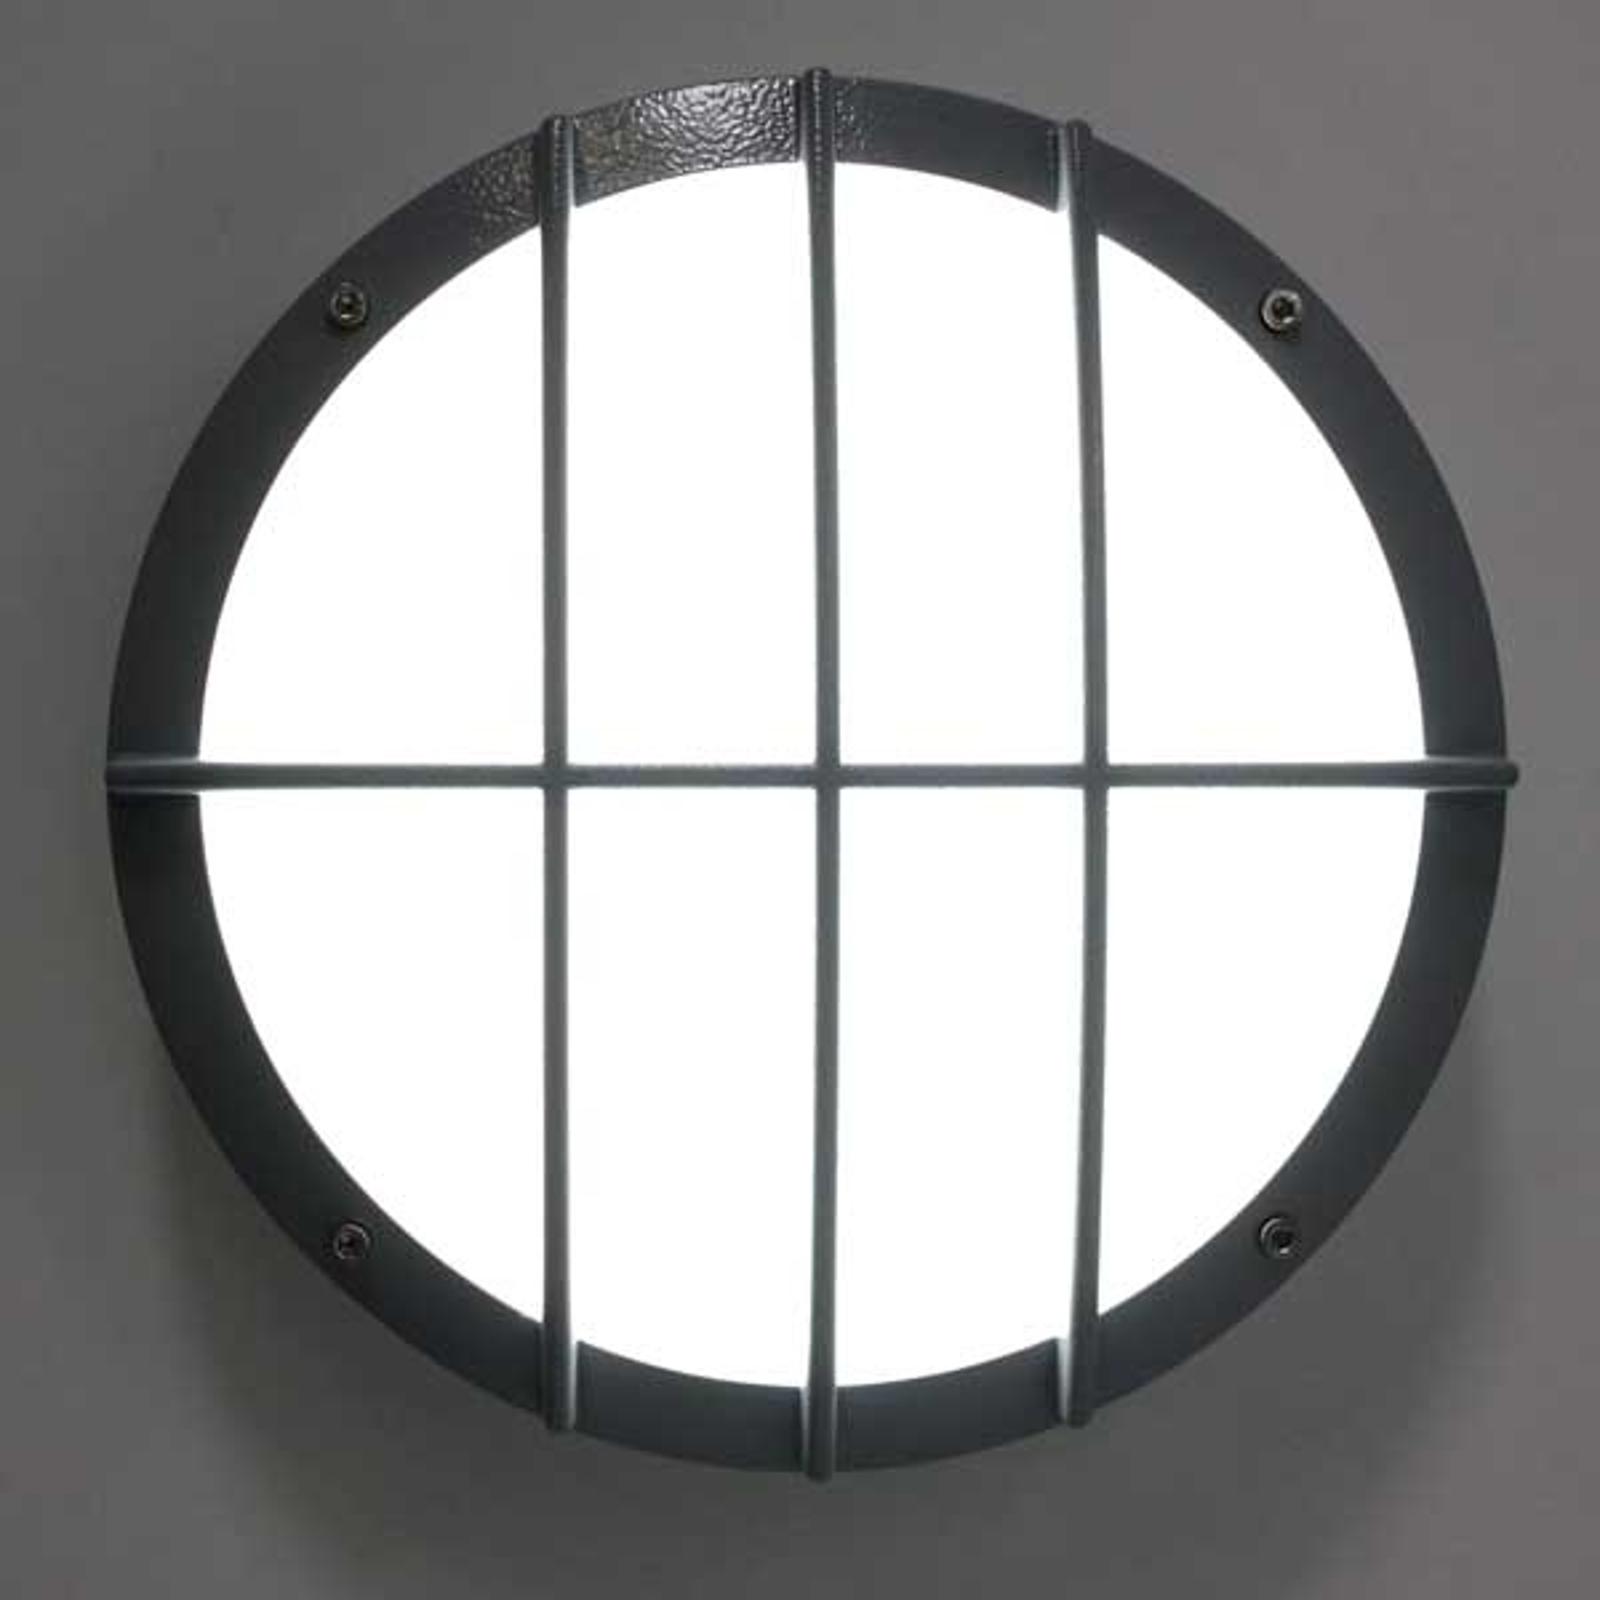 Spuitgietalu wandlamp SUN 8 LED 8 W 3 K